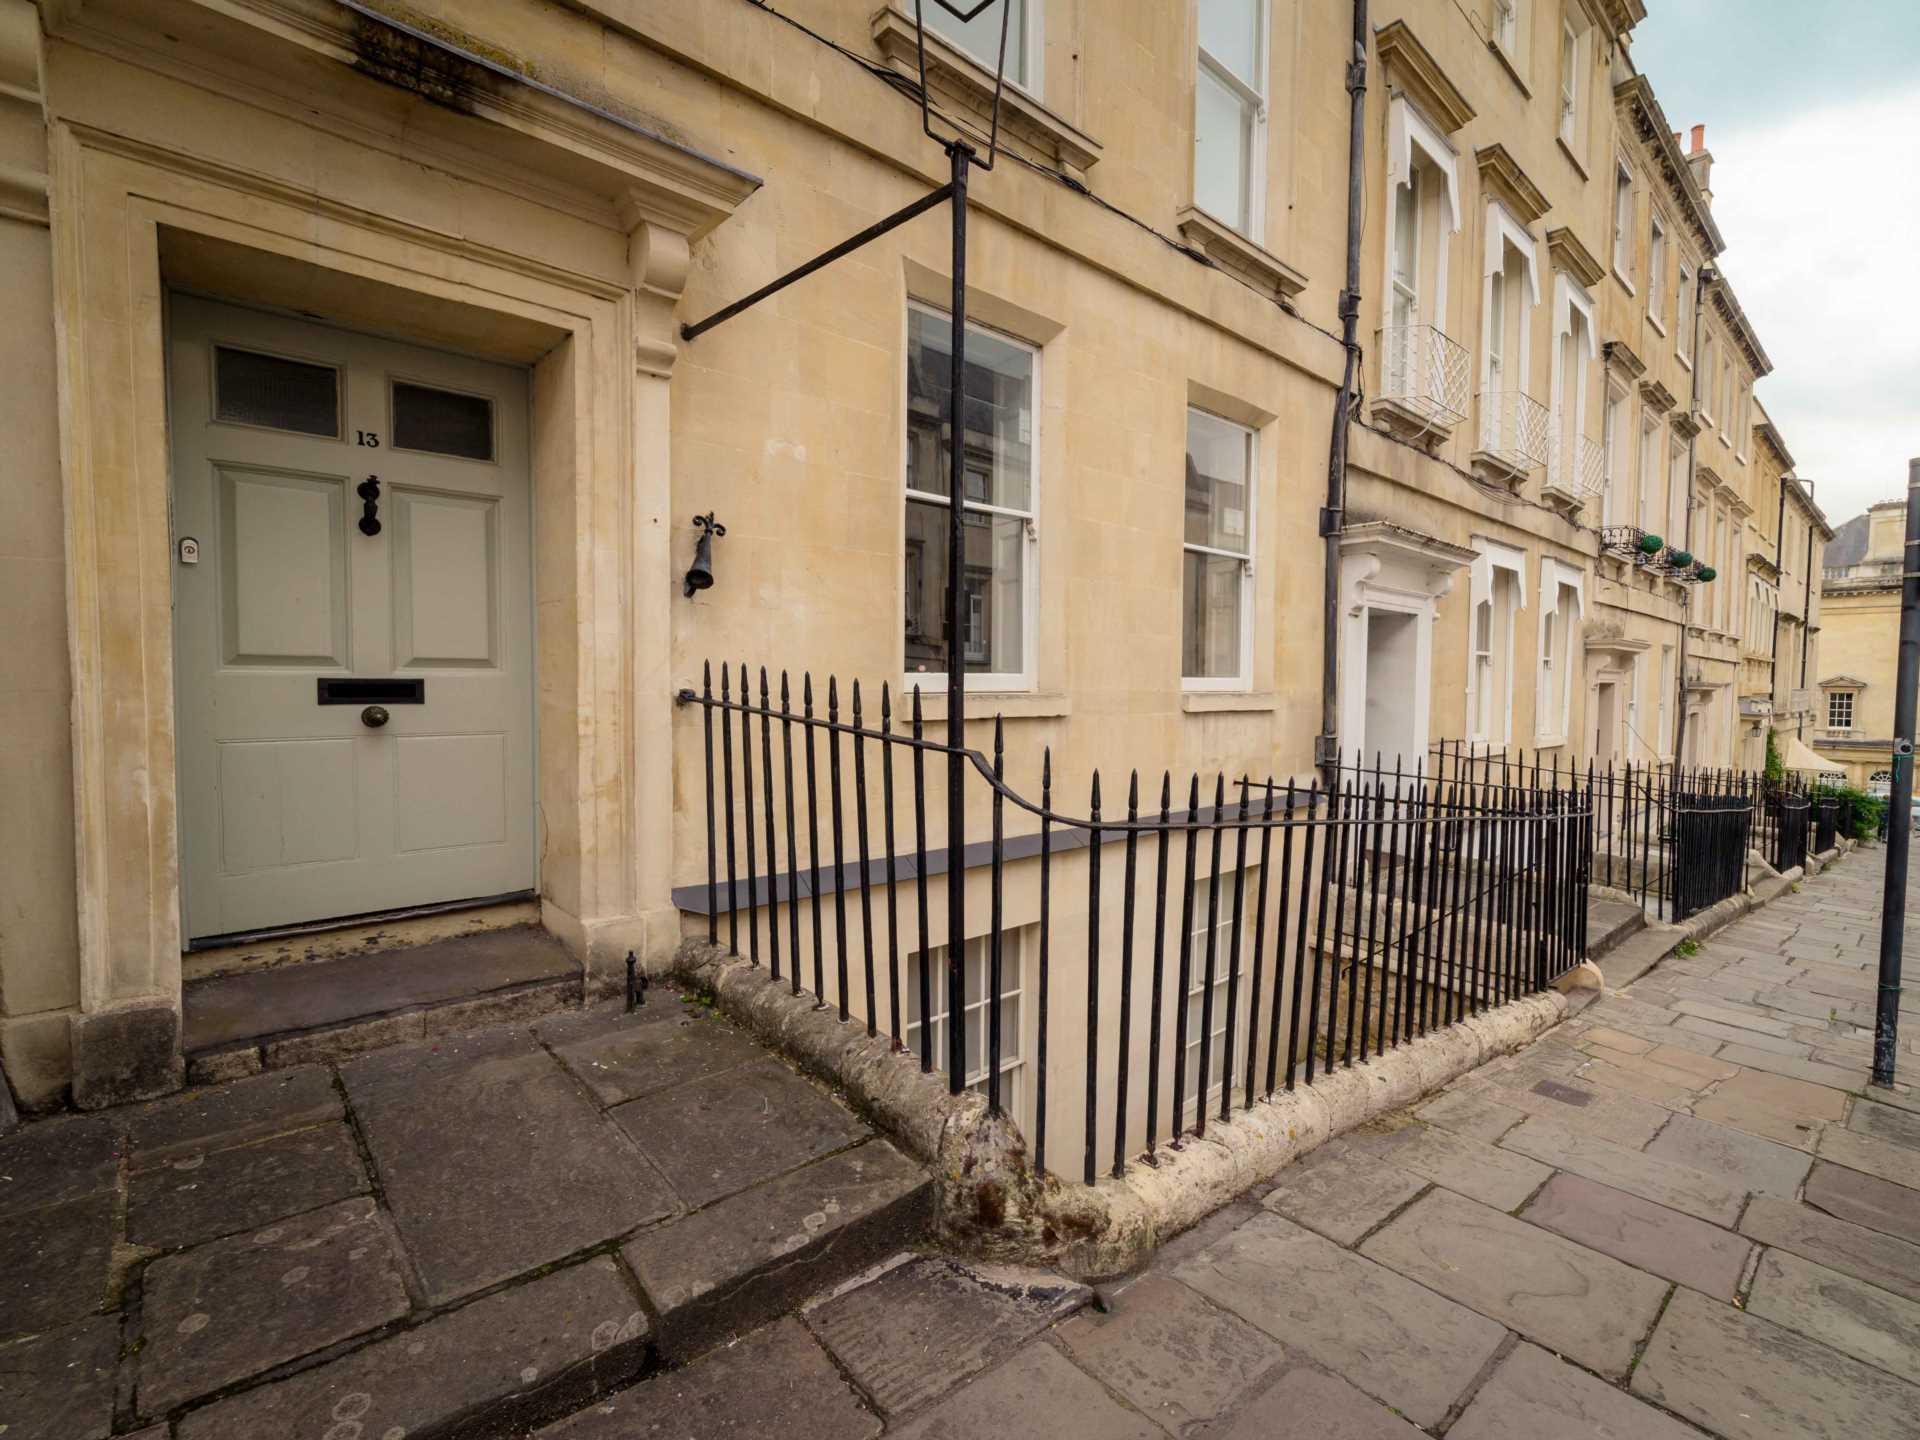 Russell Street, Bath, Image 7